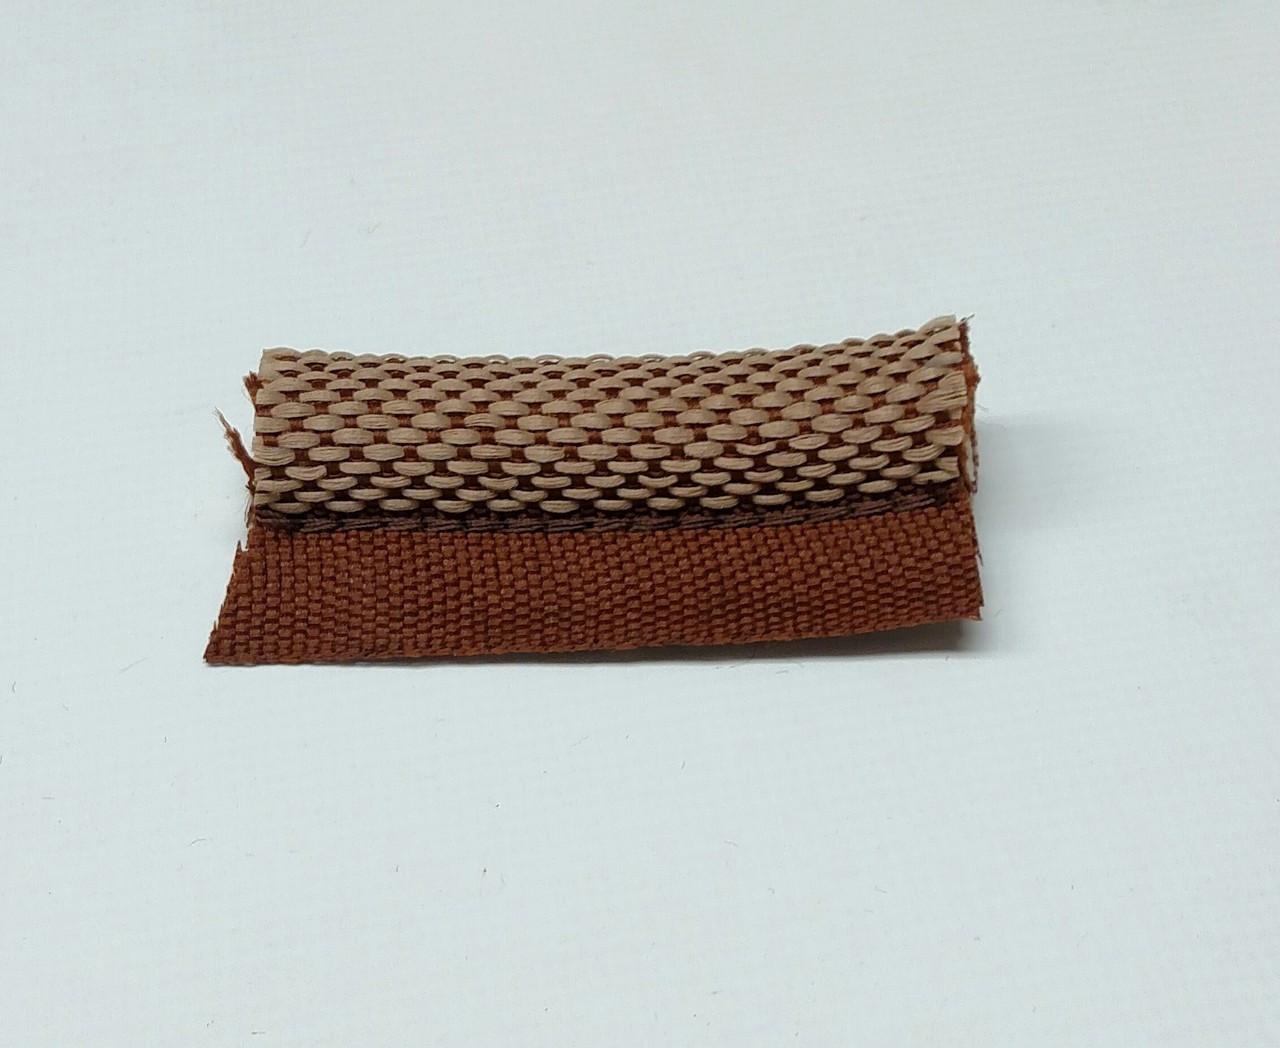 Stitched Cloth Windlace Cashmere - 4 yards